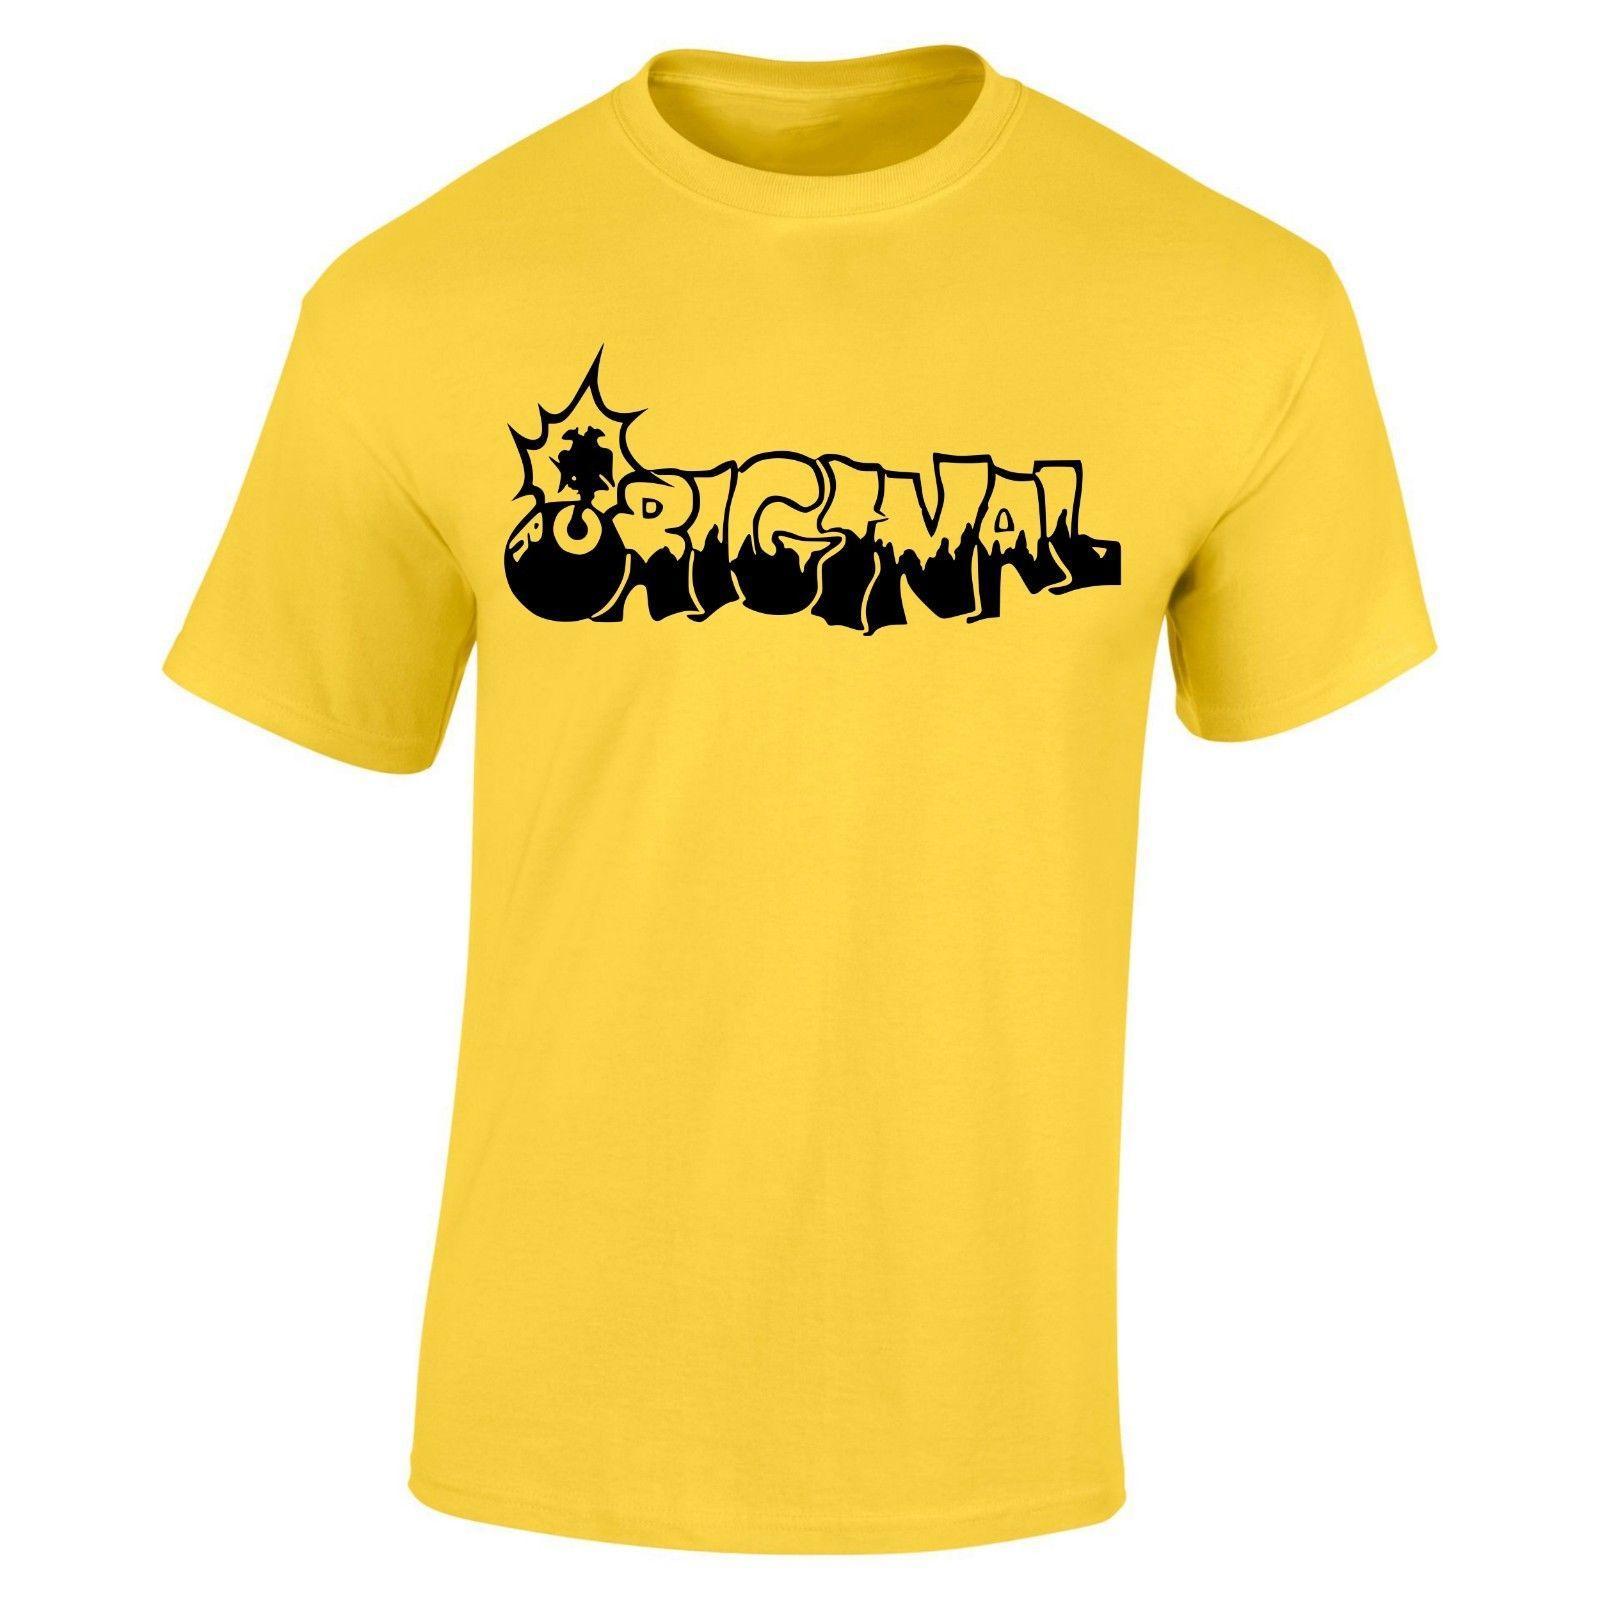 Original 21 Aek T Shirt Ultras Athensfunny Unisex Casual Funny